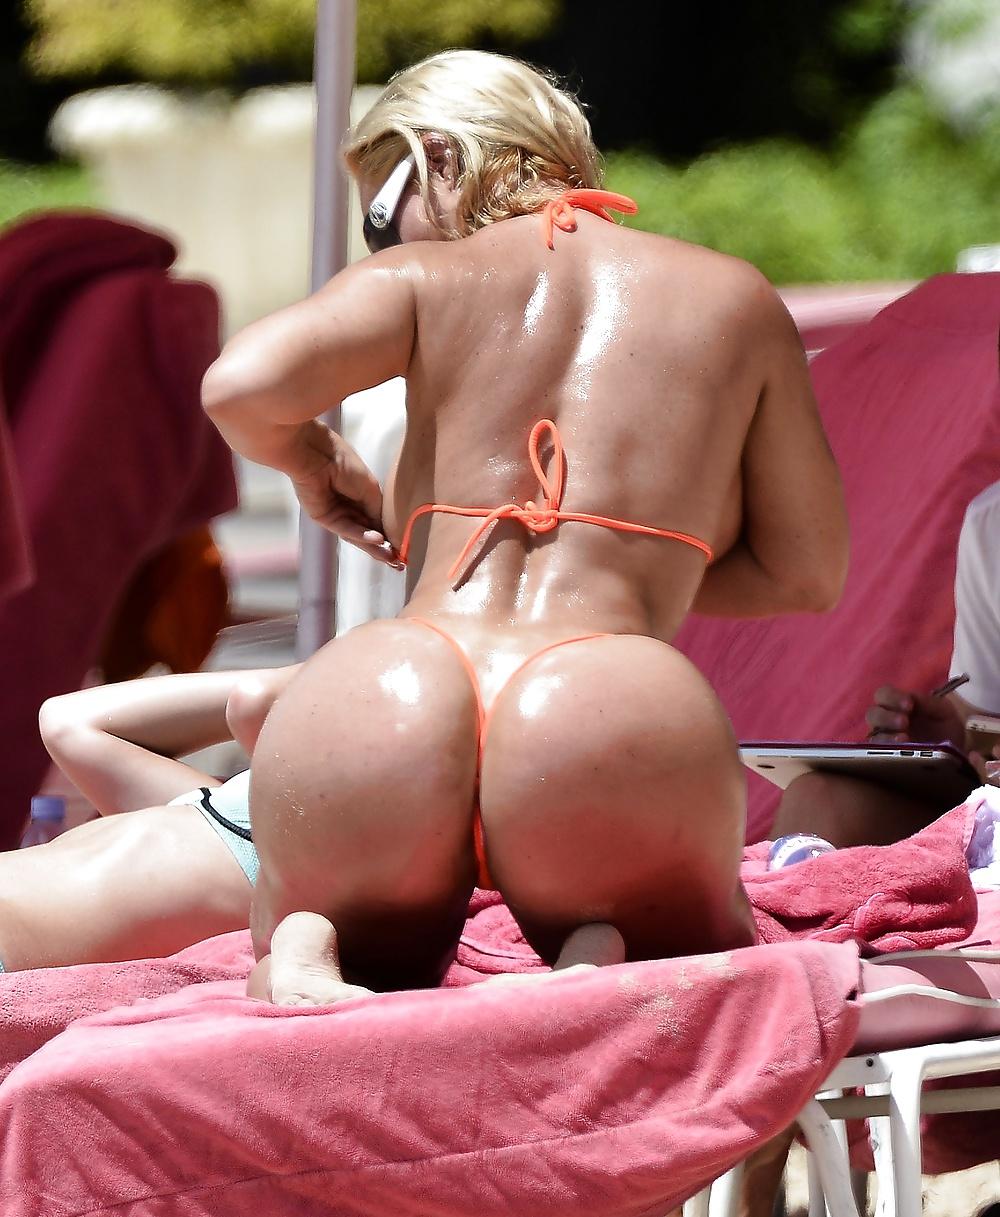 Coco bikini sex